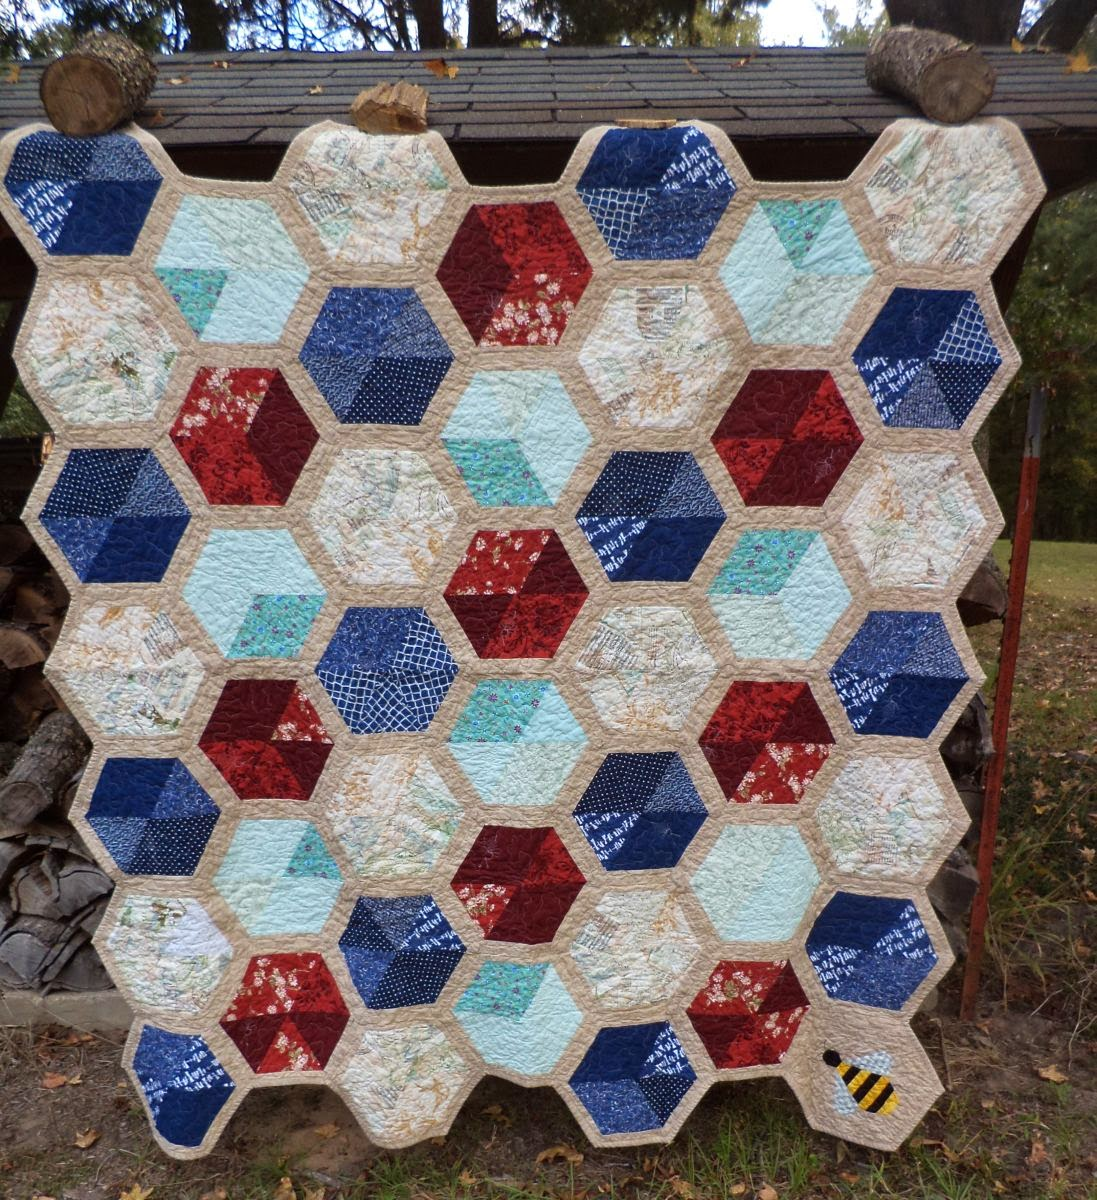 Kat & Cat Quilts: Honeycomb of Hexagons : honeycomb quilt - Adamdwight.com